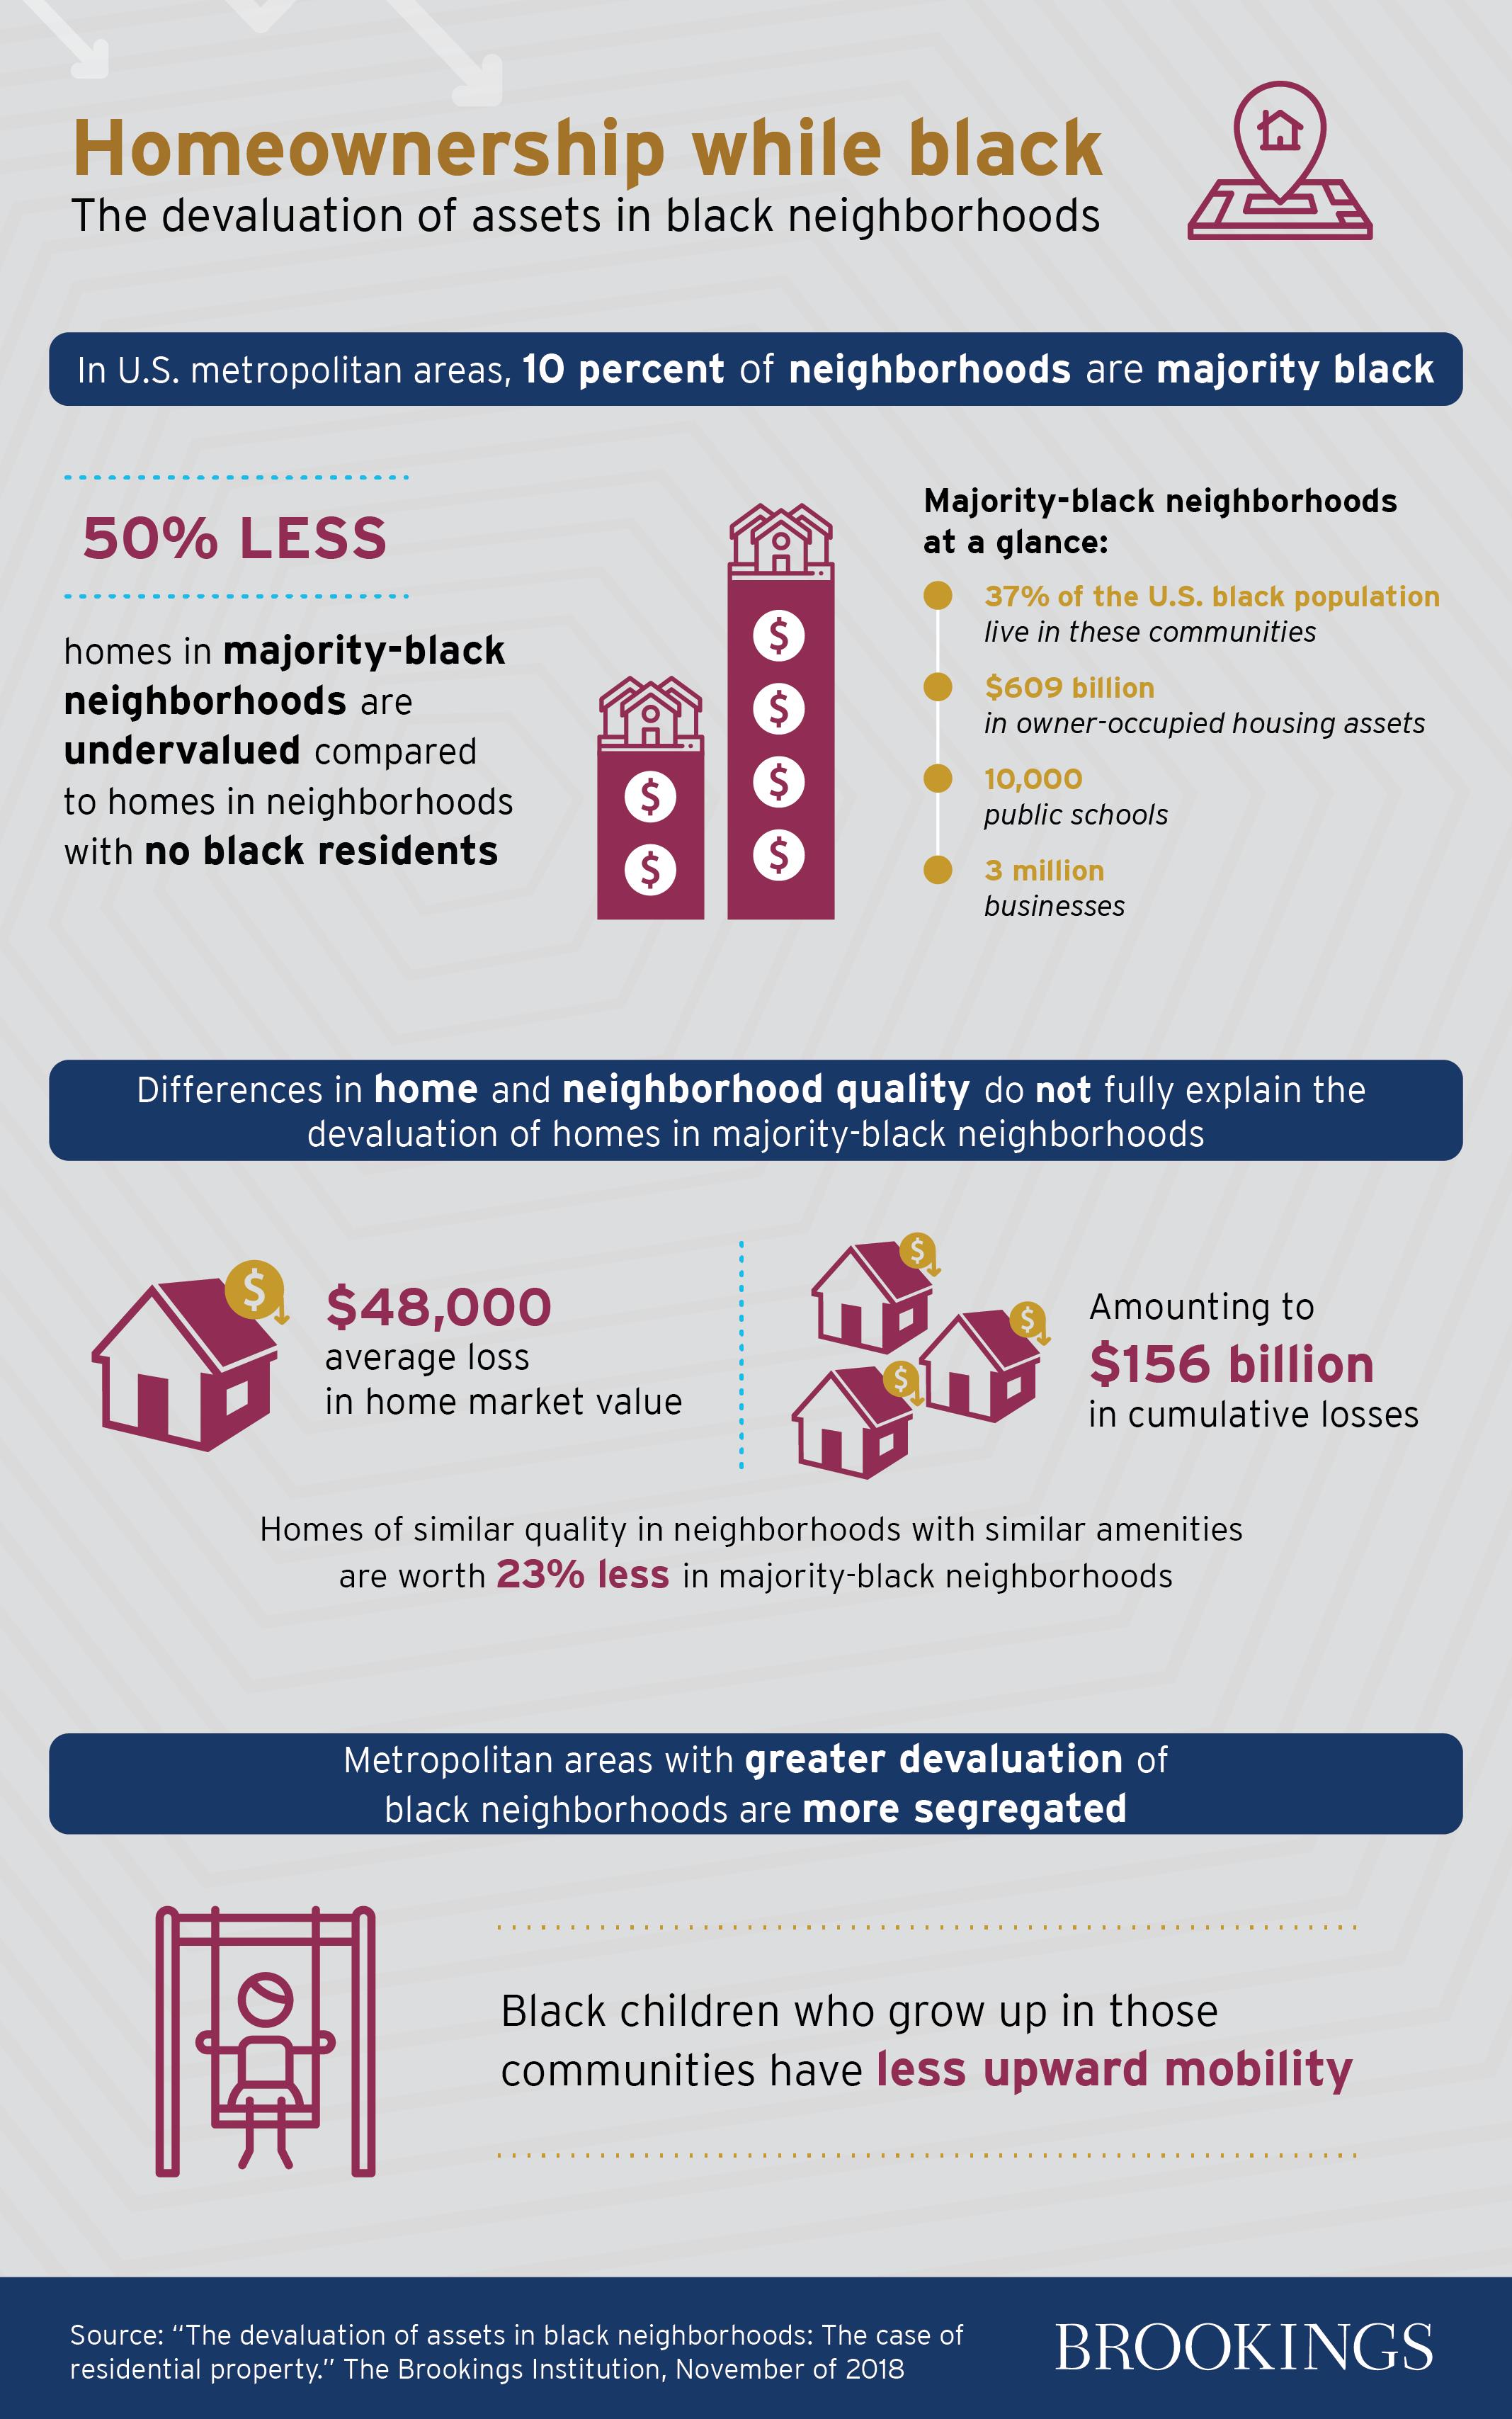 The devaluation of assets in black neighborhoods